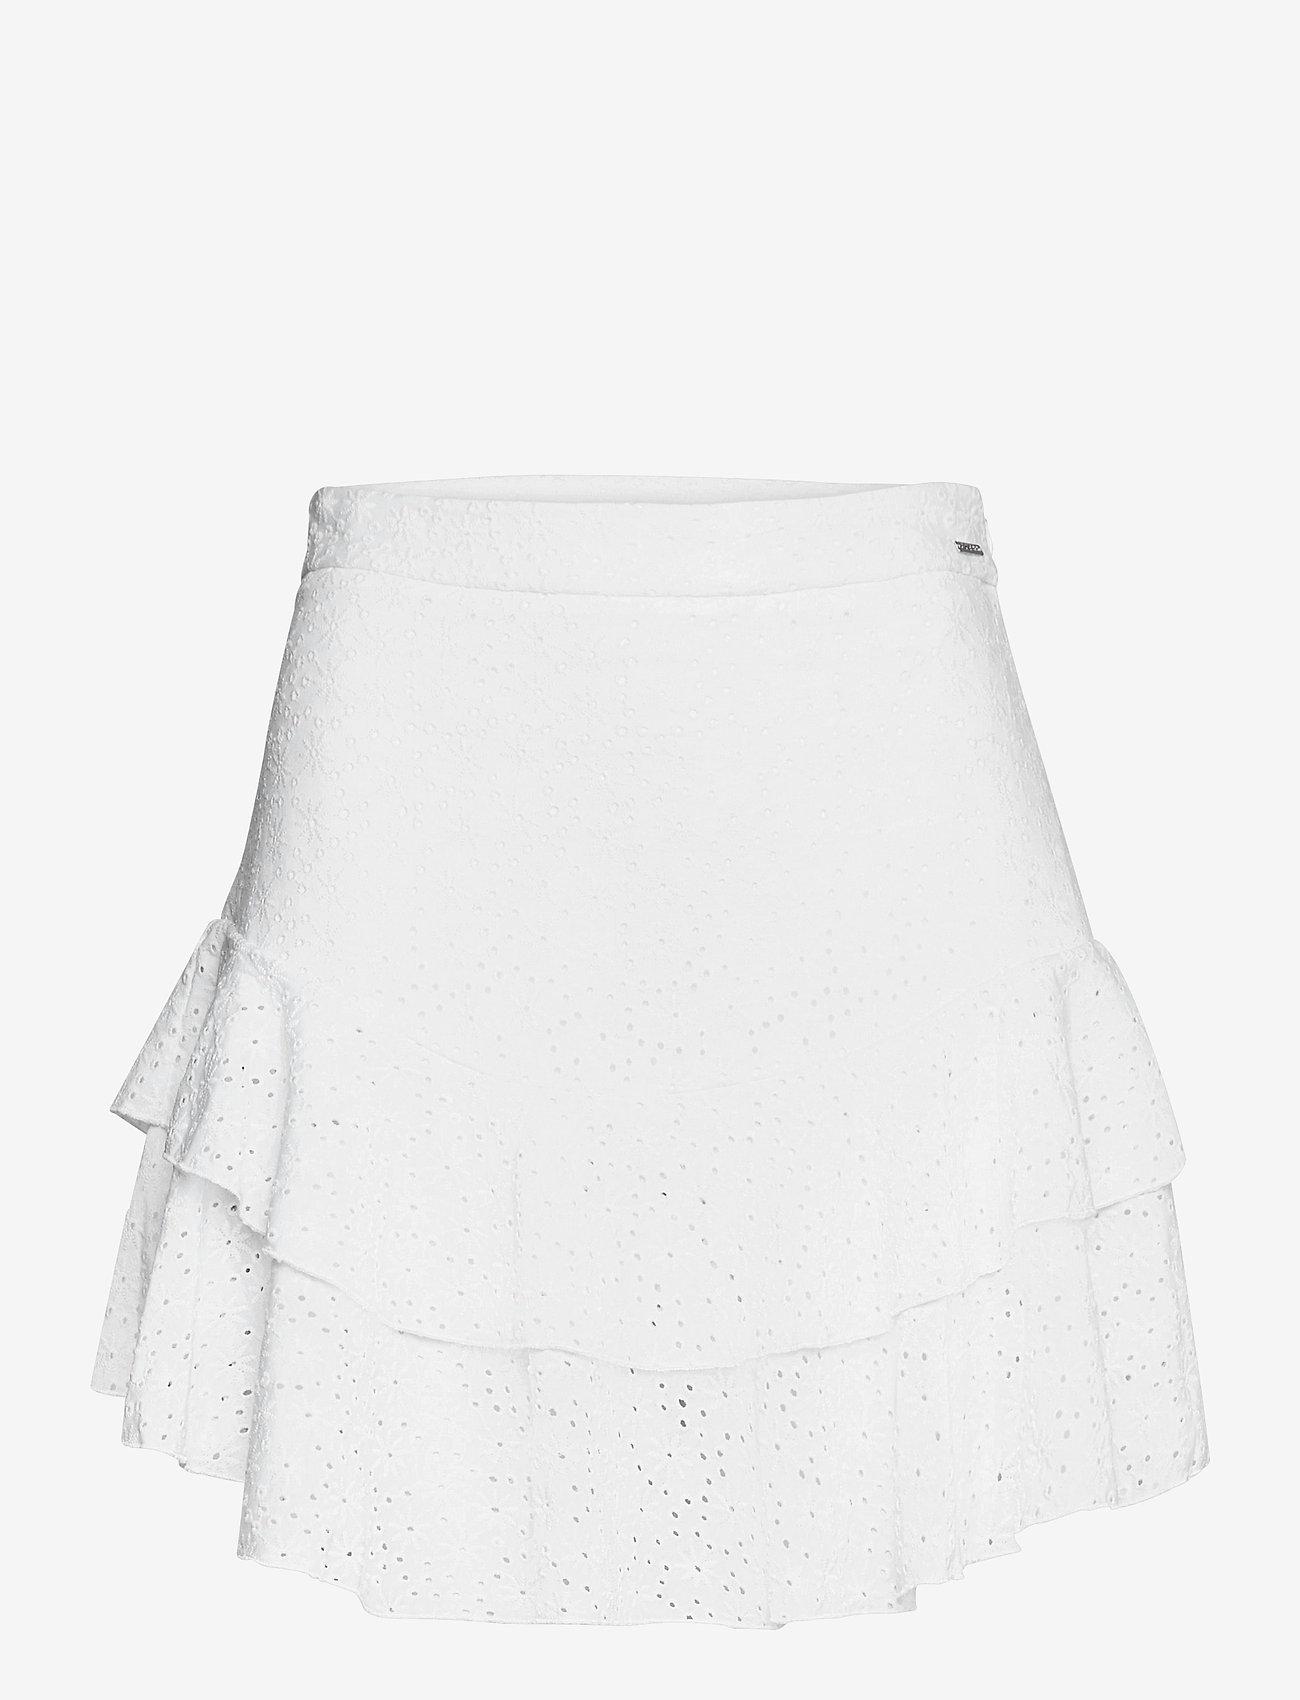 GUESS Jeans - TATIANA SKIRT - korta kjolar - true white a000 - 0